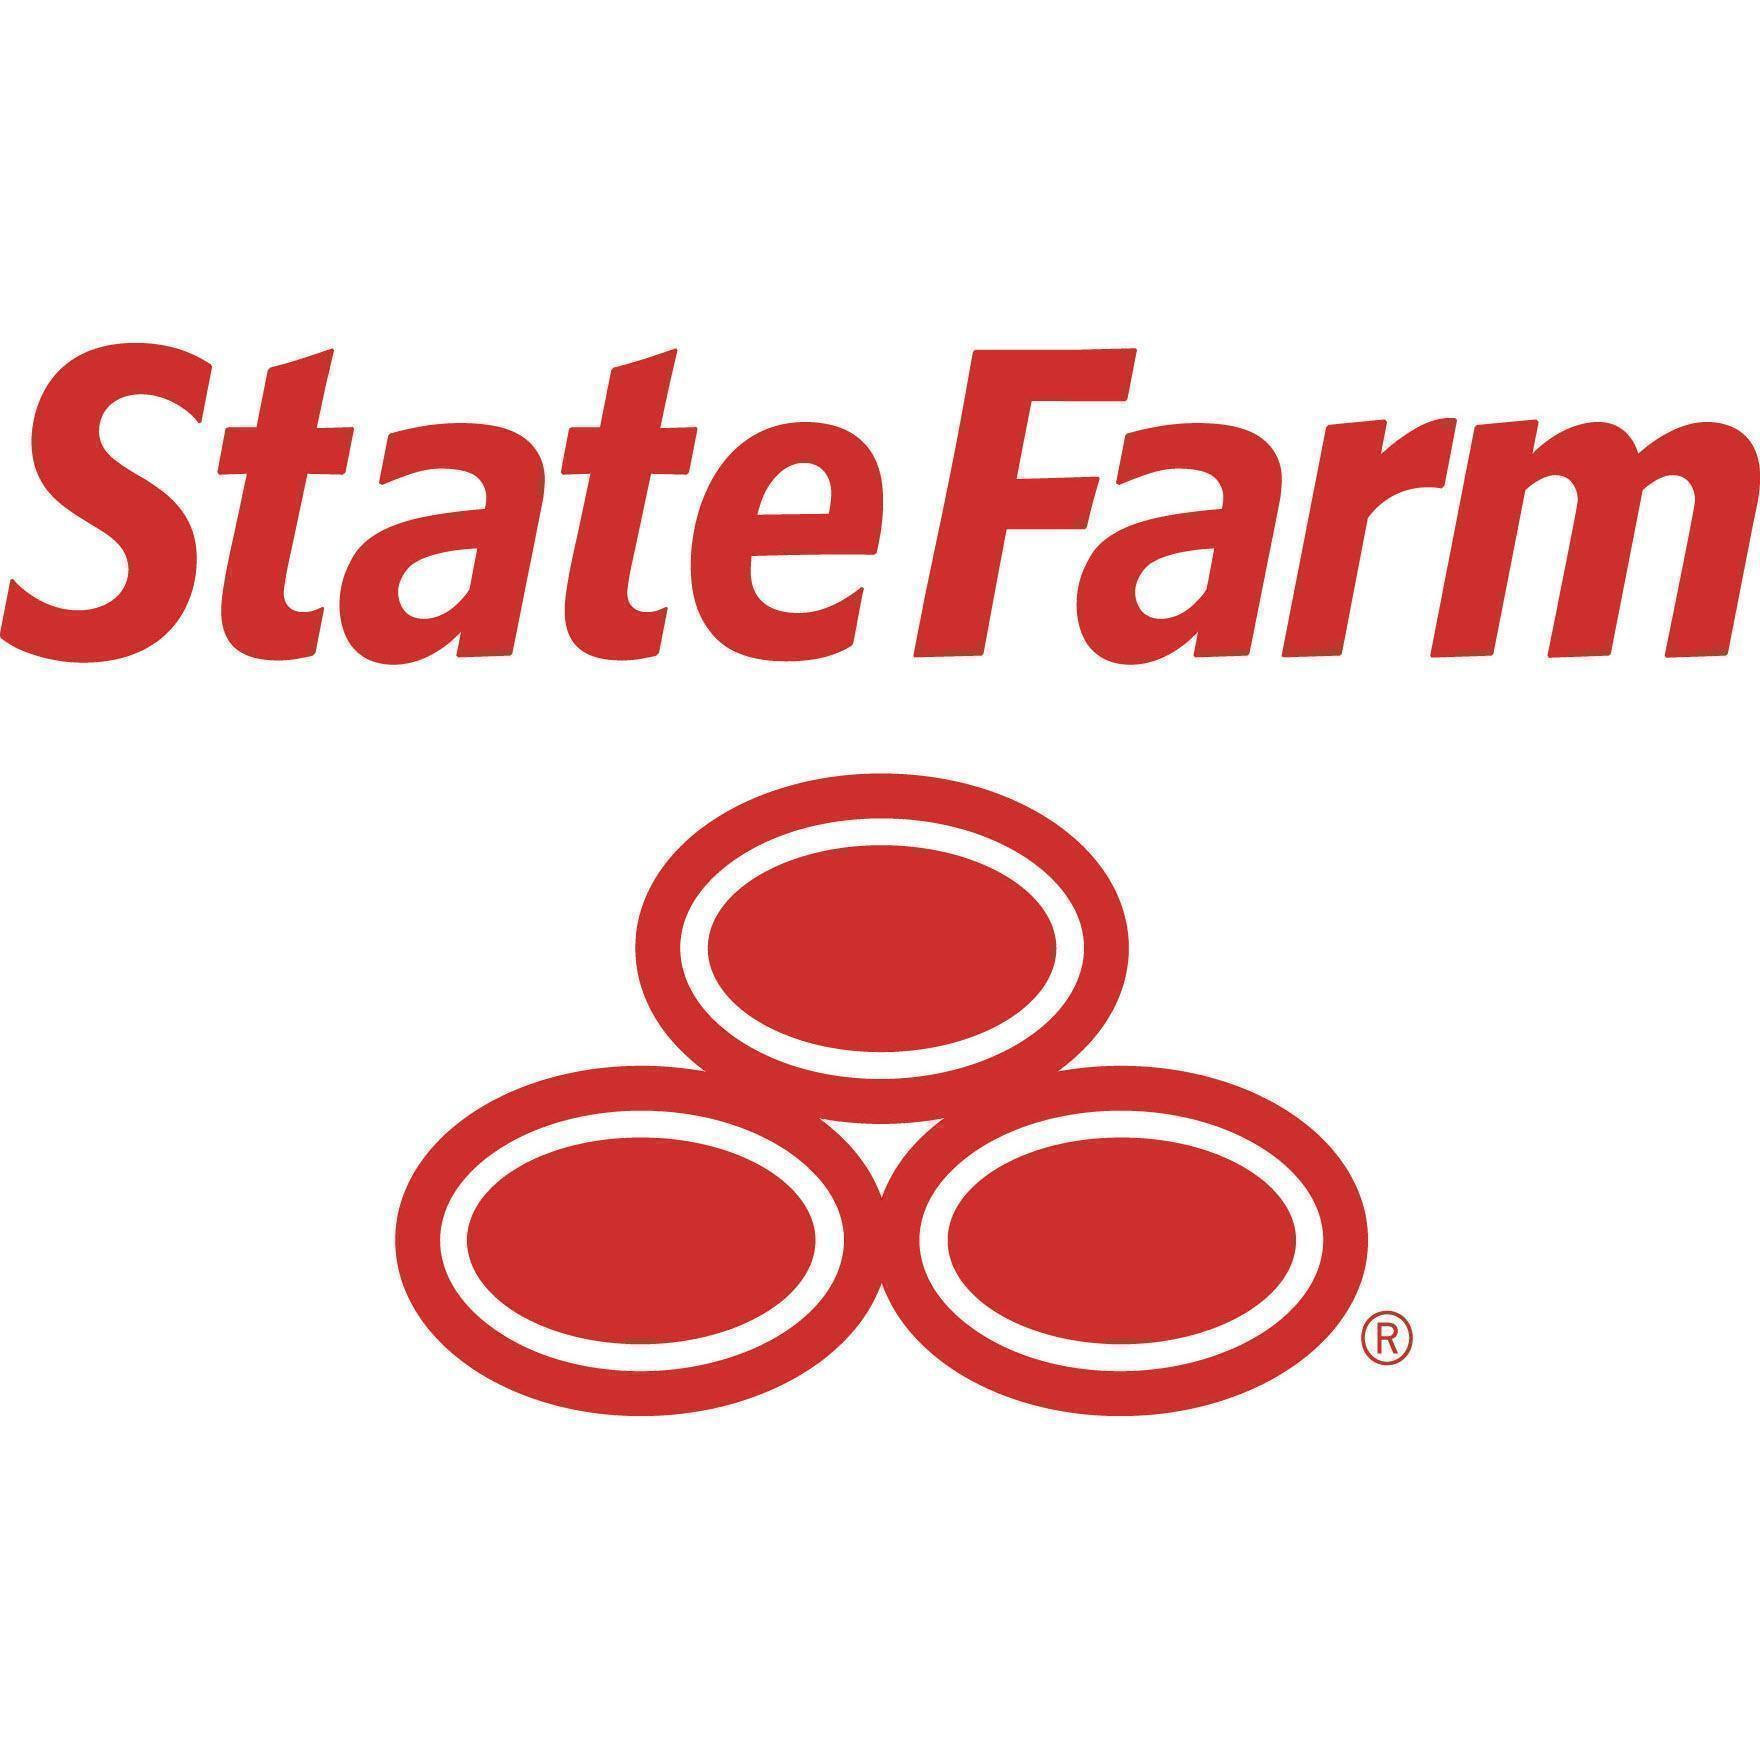 W.C. Starks - State Farm Insurance Agent